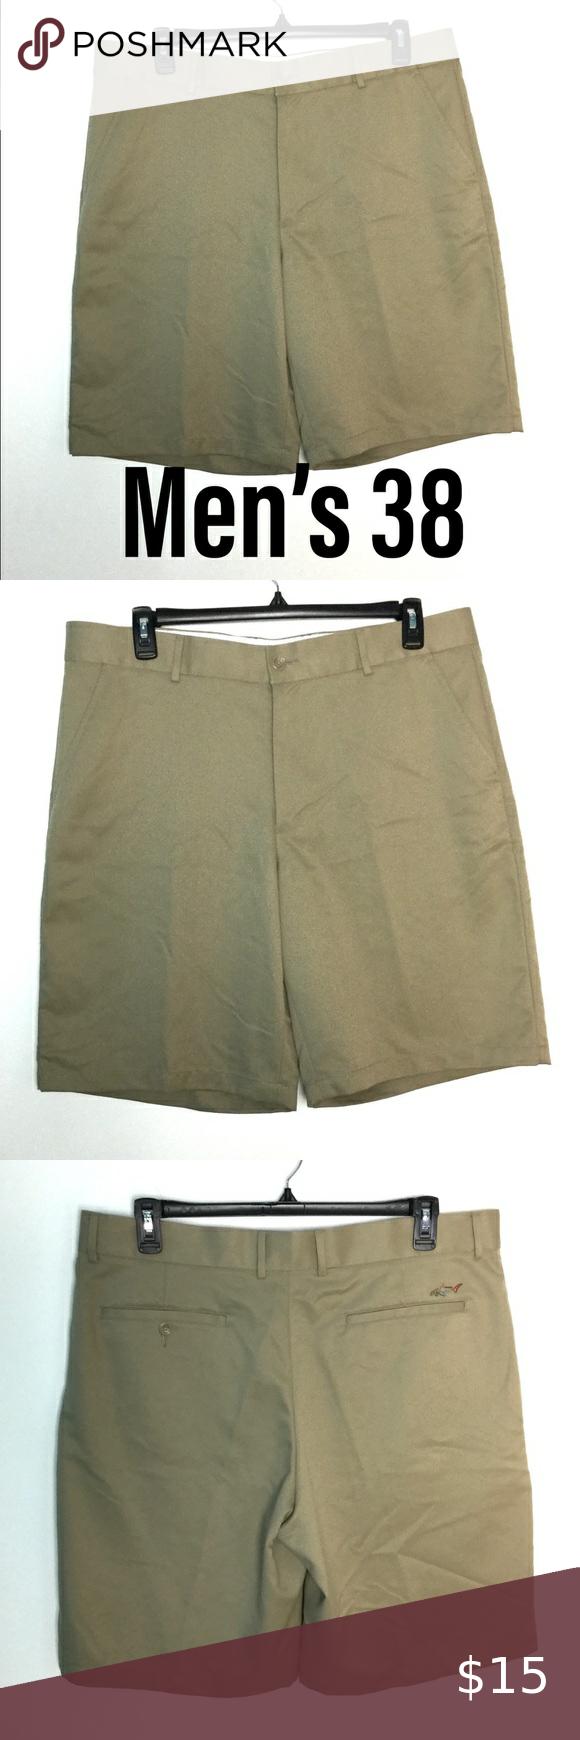 Greg Norman 38 Golf Khaki Shorts Khakis Chino Nwot In 2020 Khaki Shorts Khaki Chinos Chino Shorts Mens